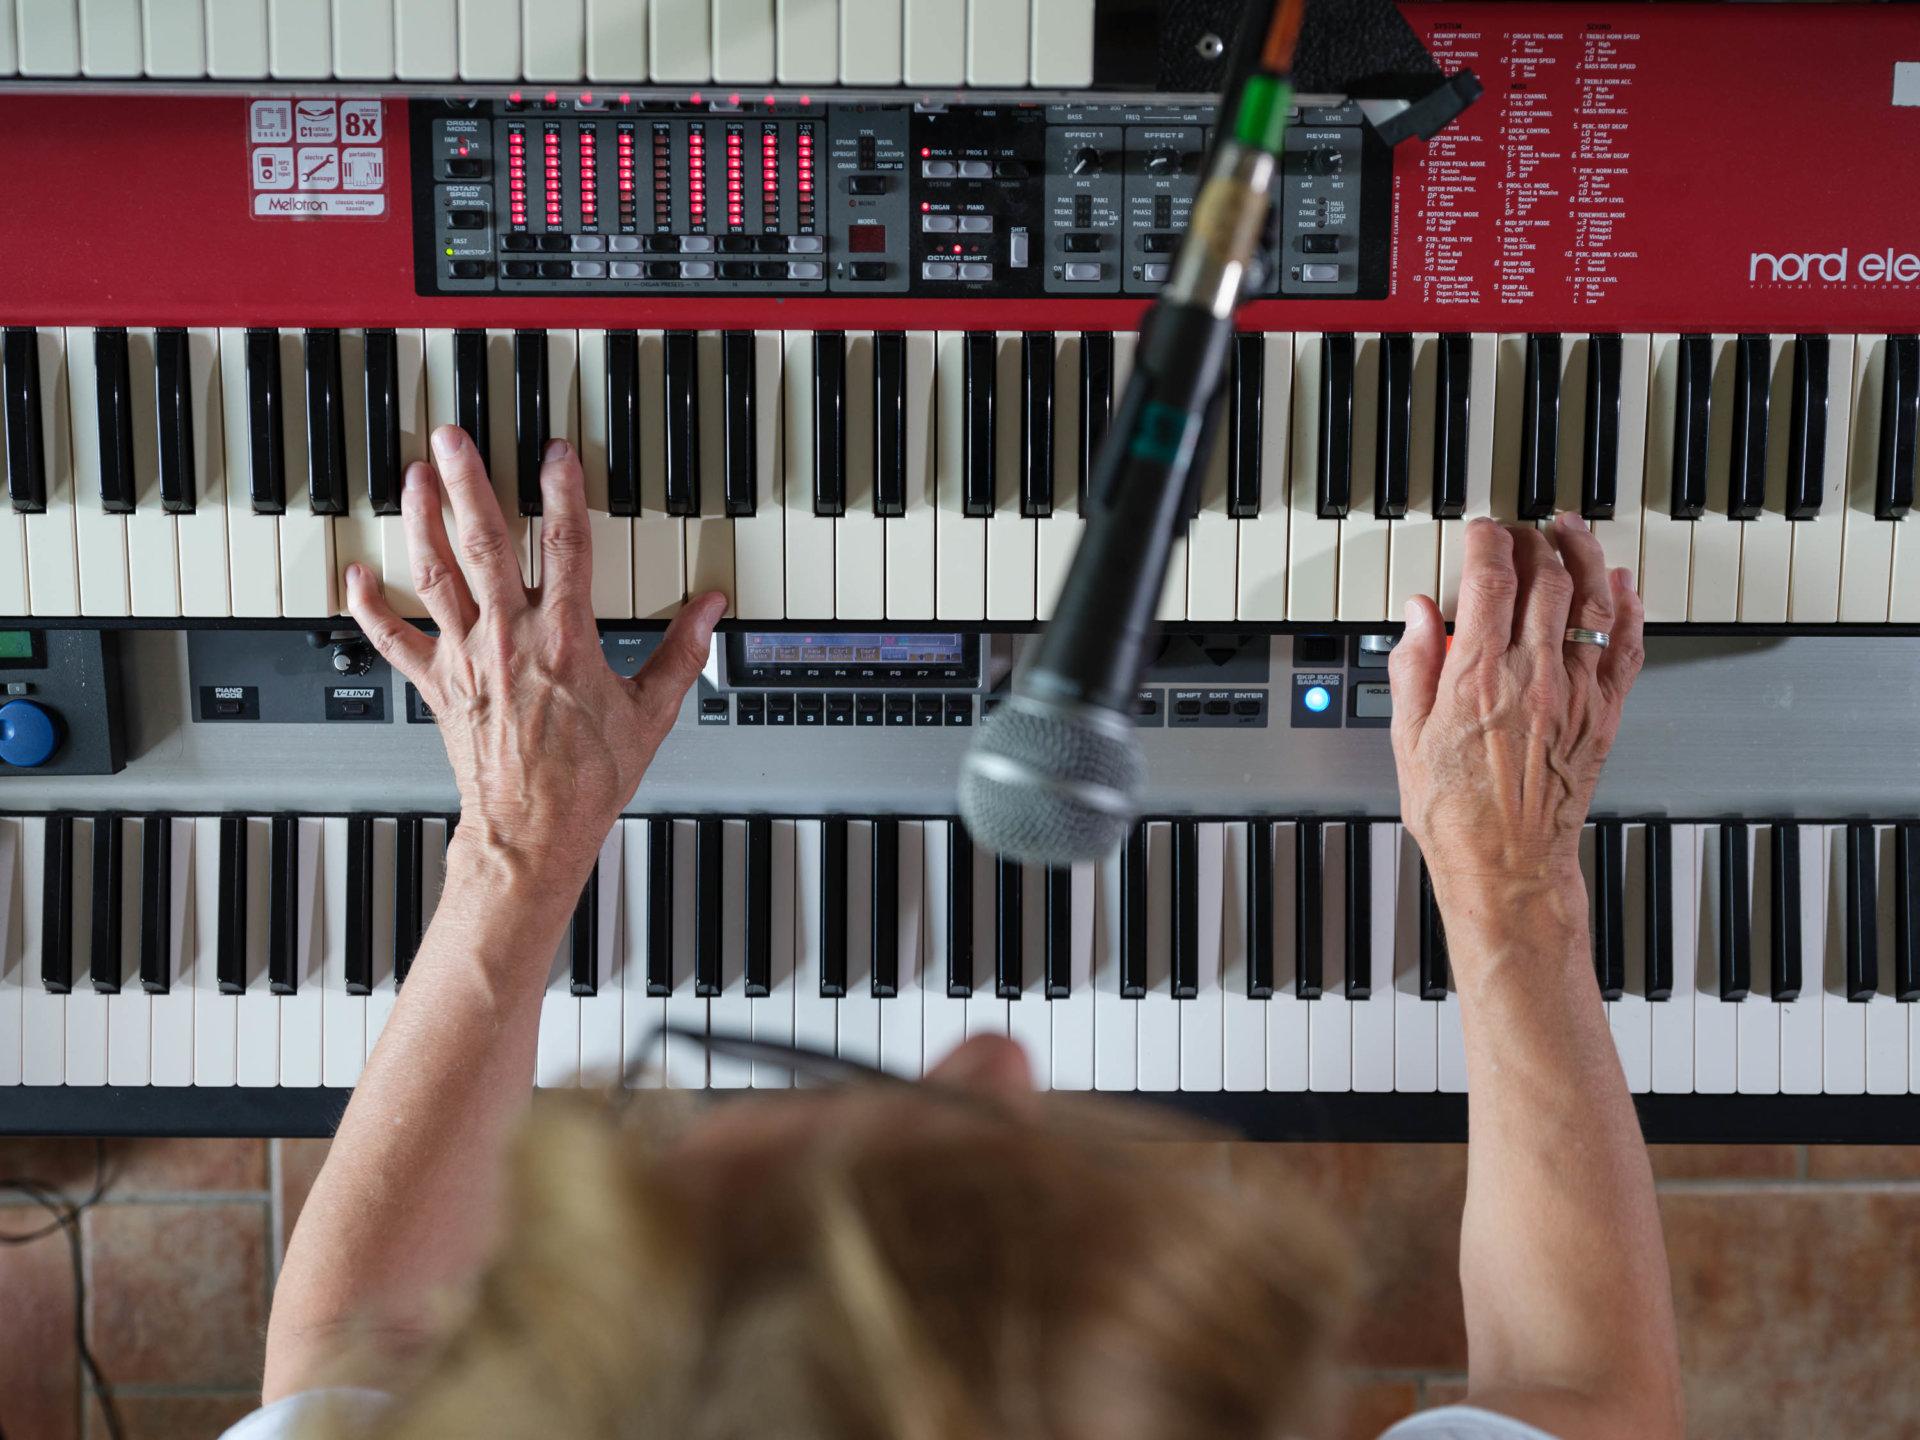 Keyboarder, Pianist, Proberaum, Ritchie Barton, Serrie, Silly, Studio, Tonstudio, band, meisterfinger